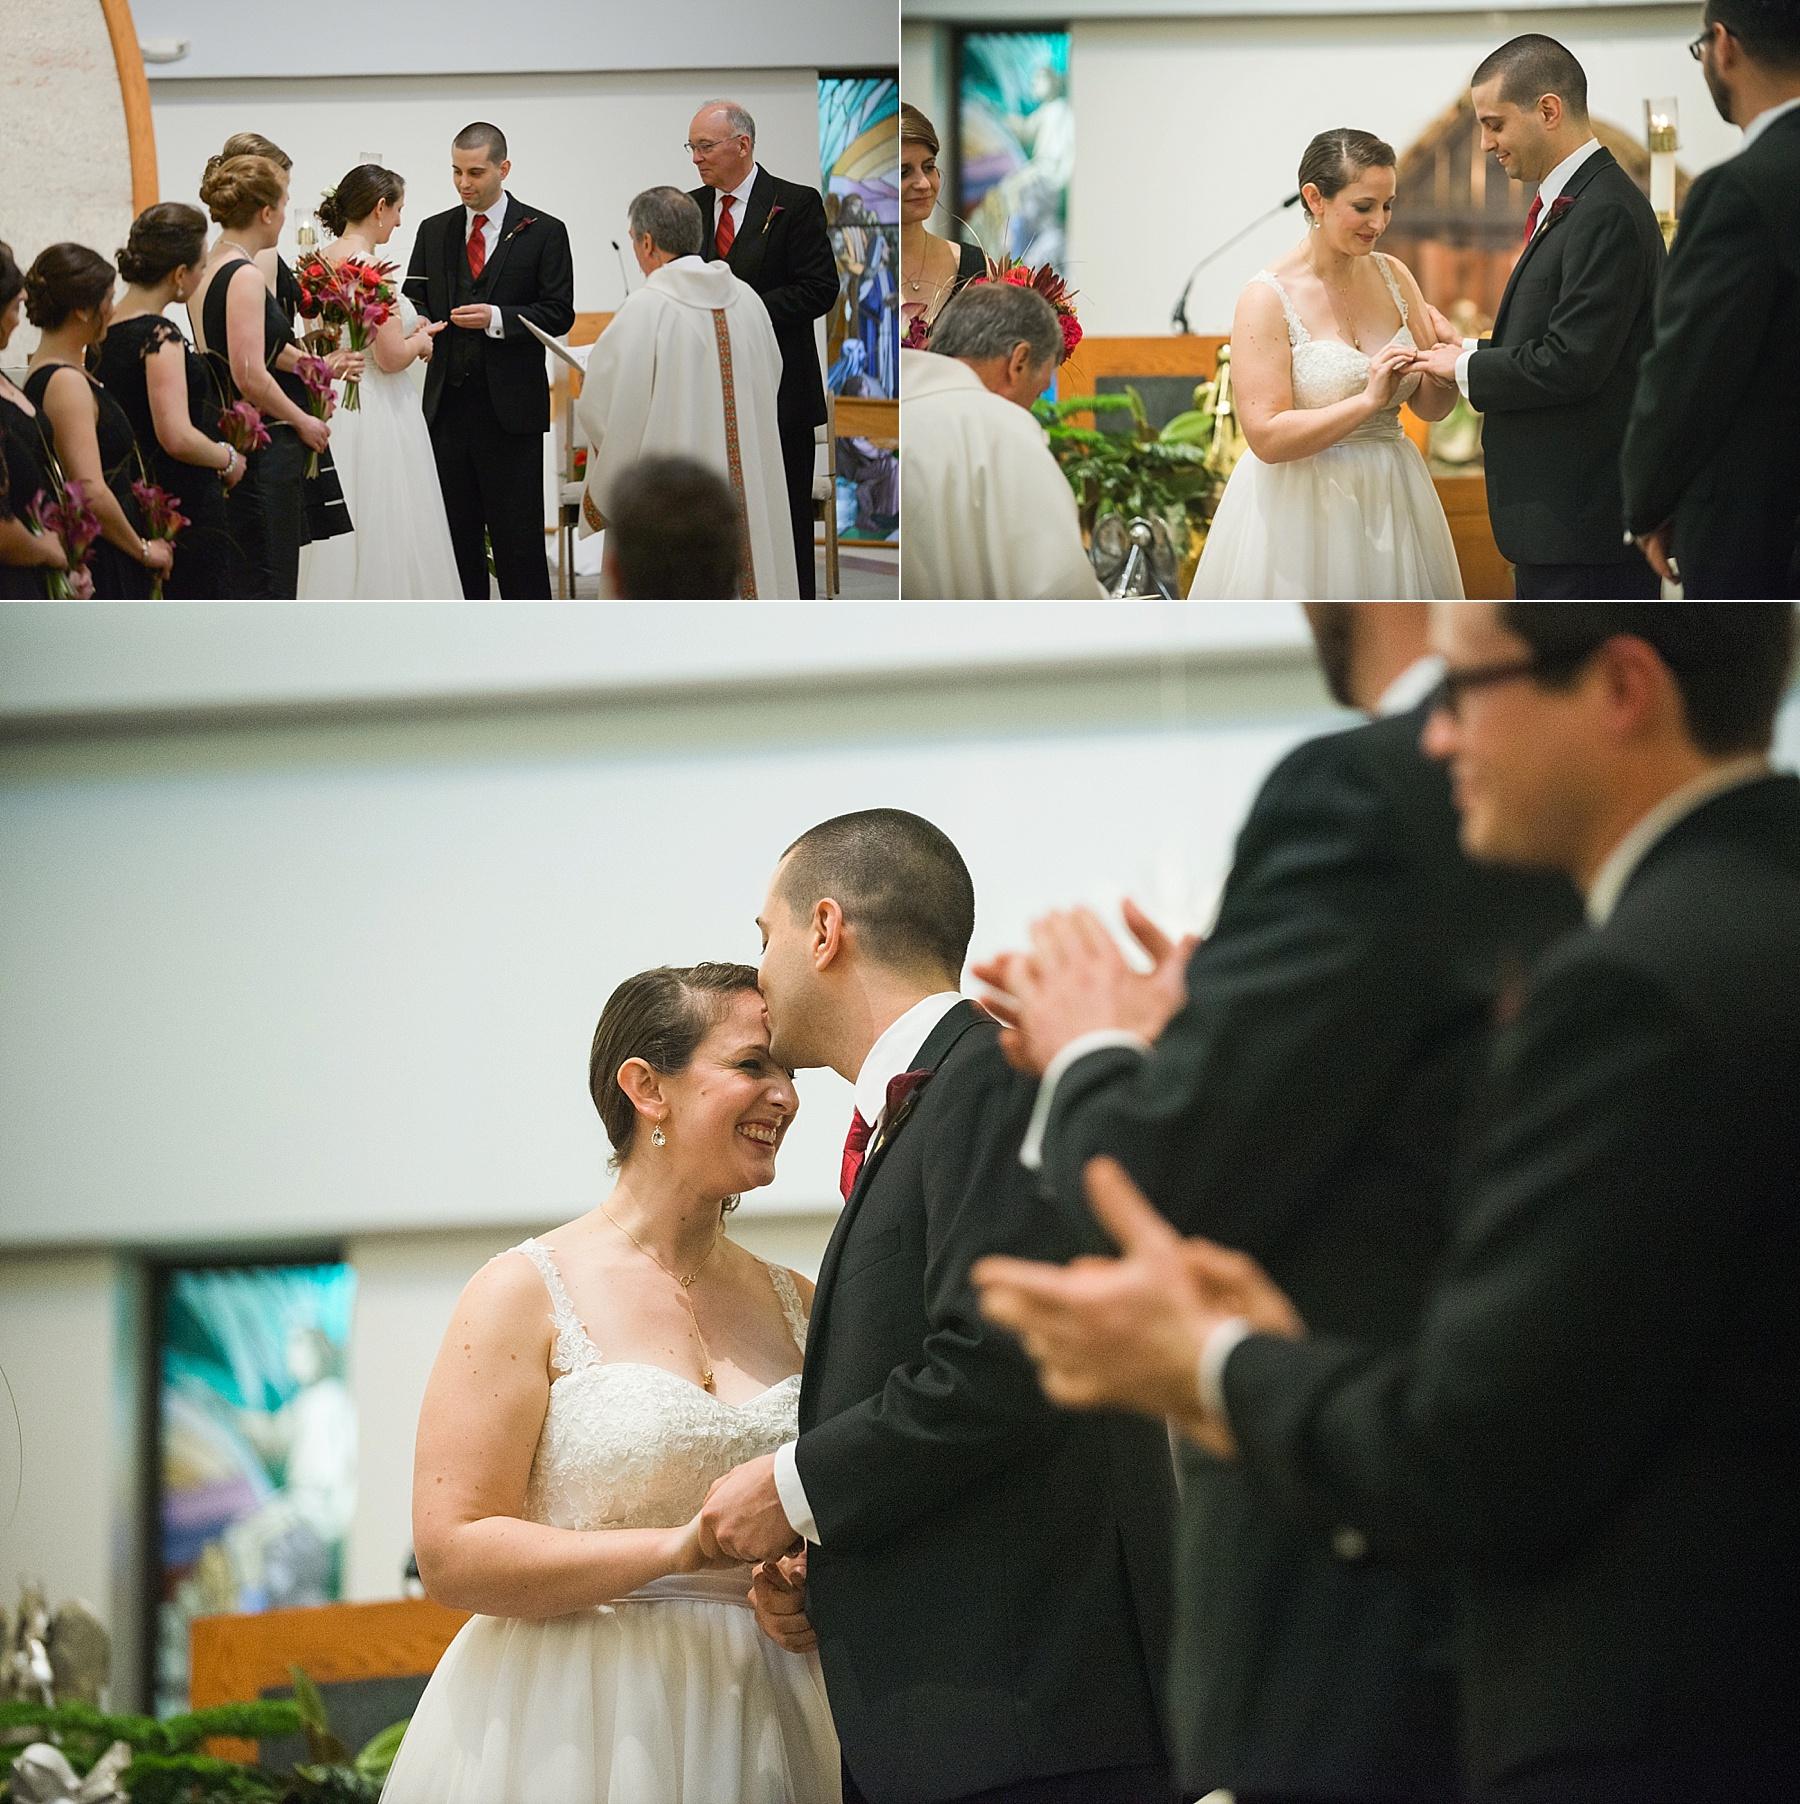 john-marshall-hotel-wedding-richmond-va_0025.jpg